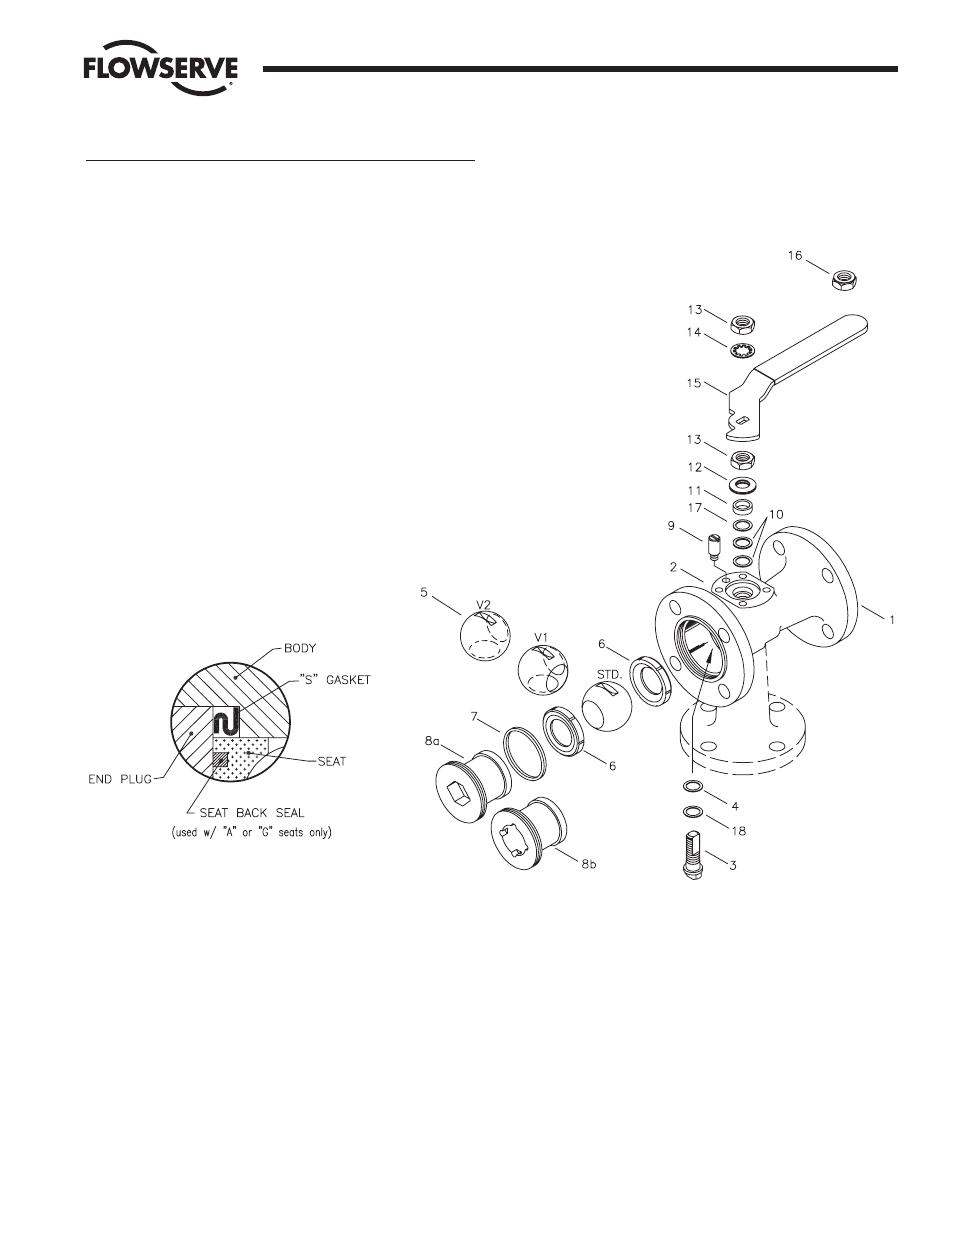 Mccanna/marpac valves, 1½